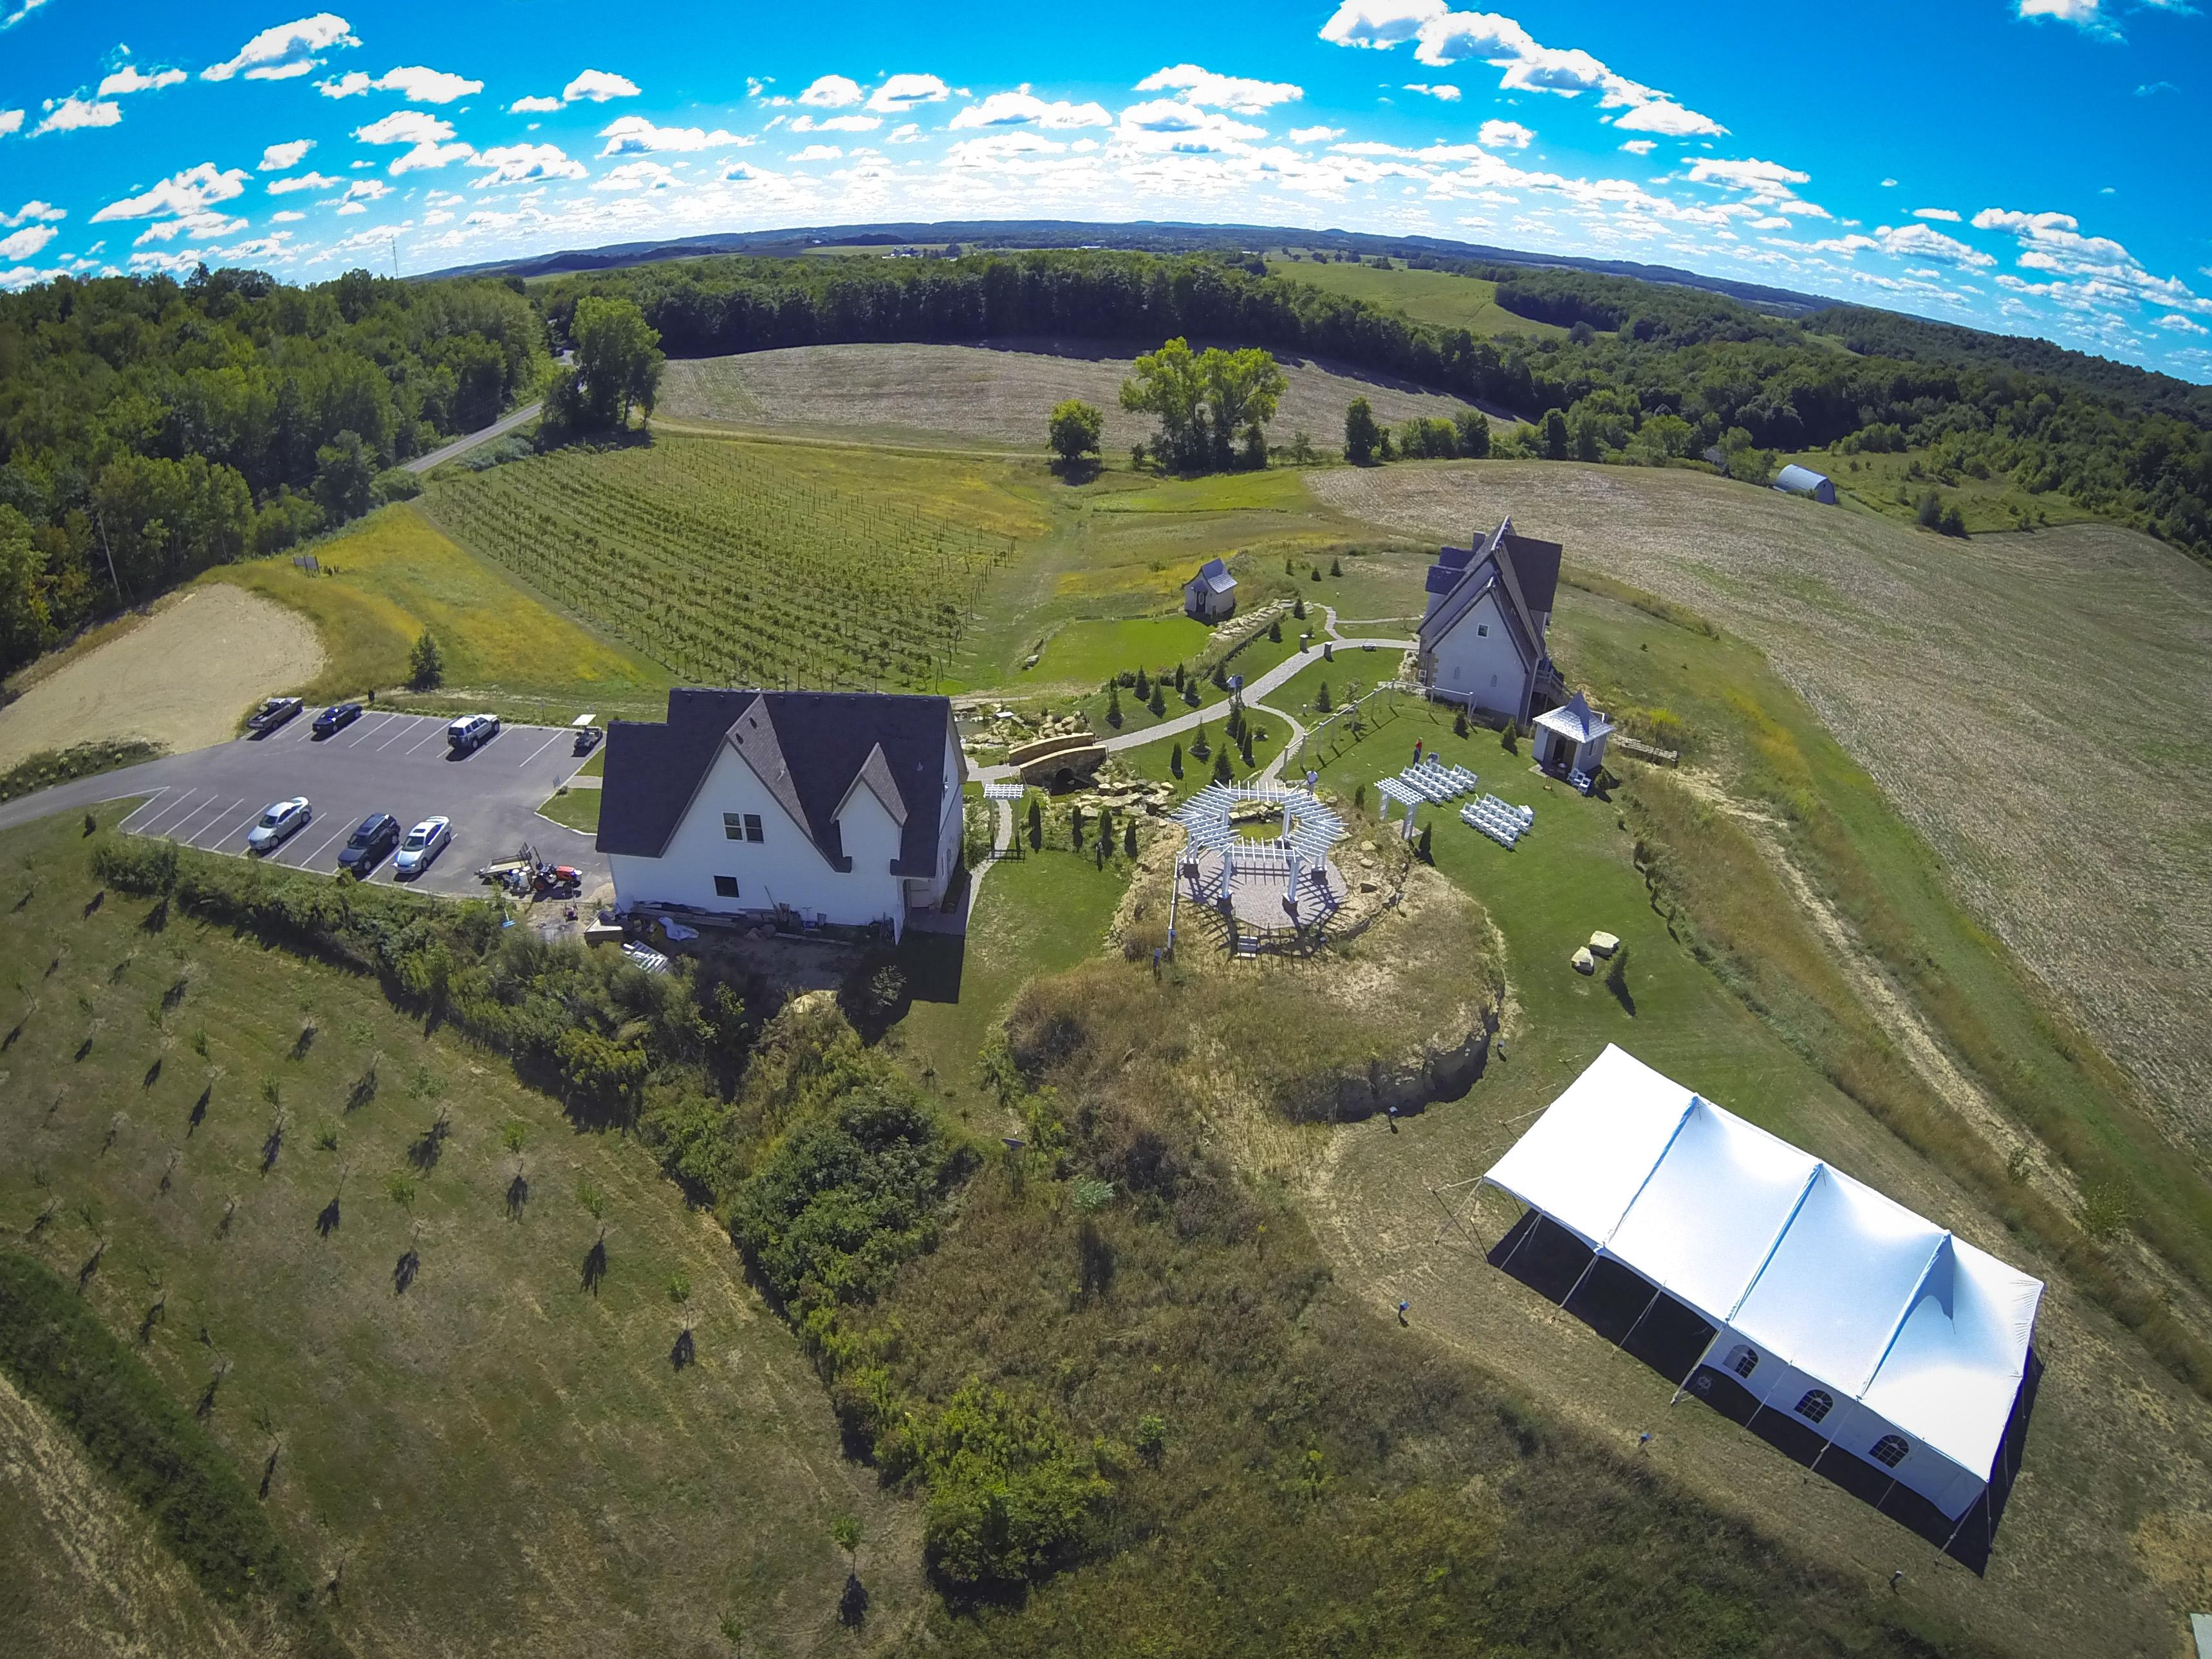 Menomonie (WI) United States  city photos gallery : winery shoot city menomonie county or state wi country united states ...